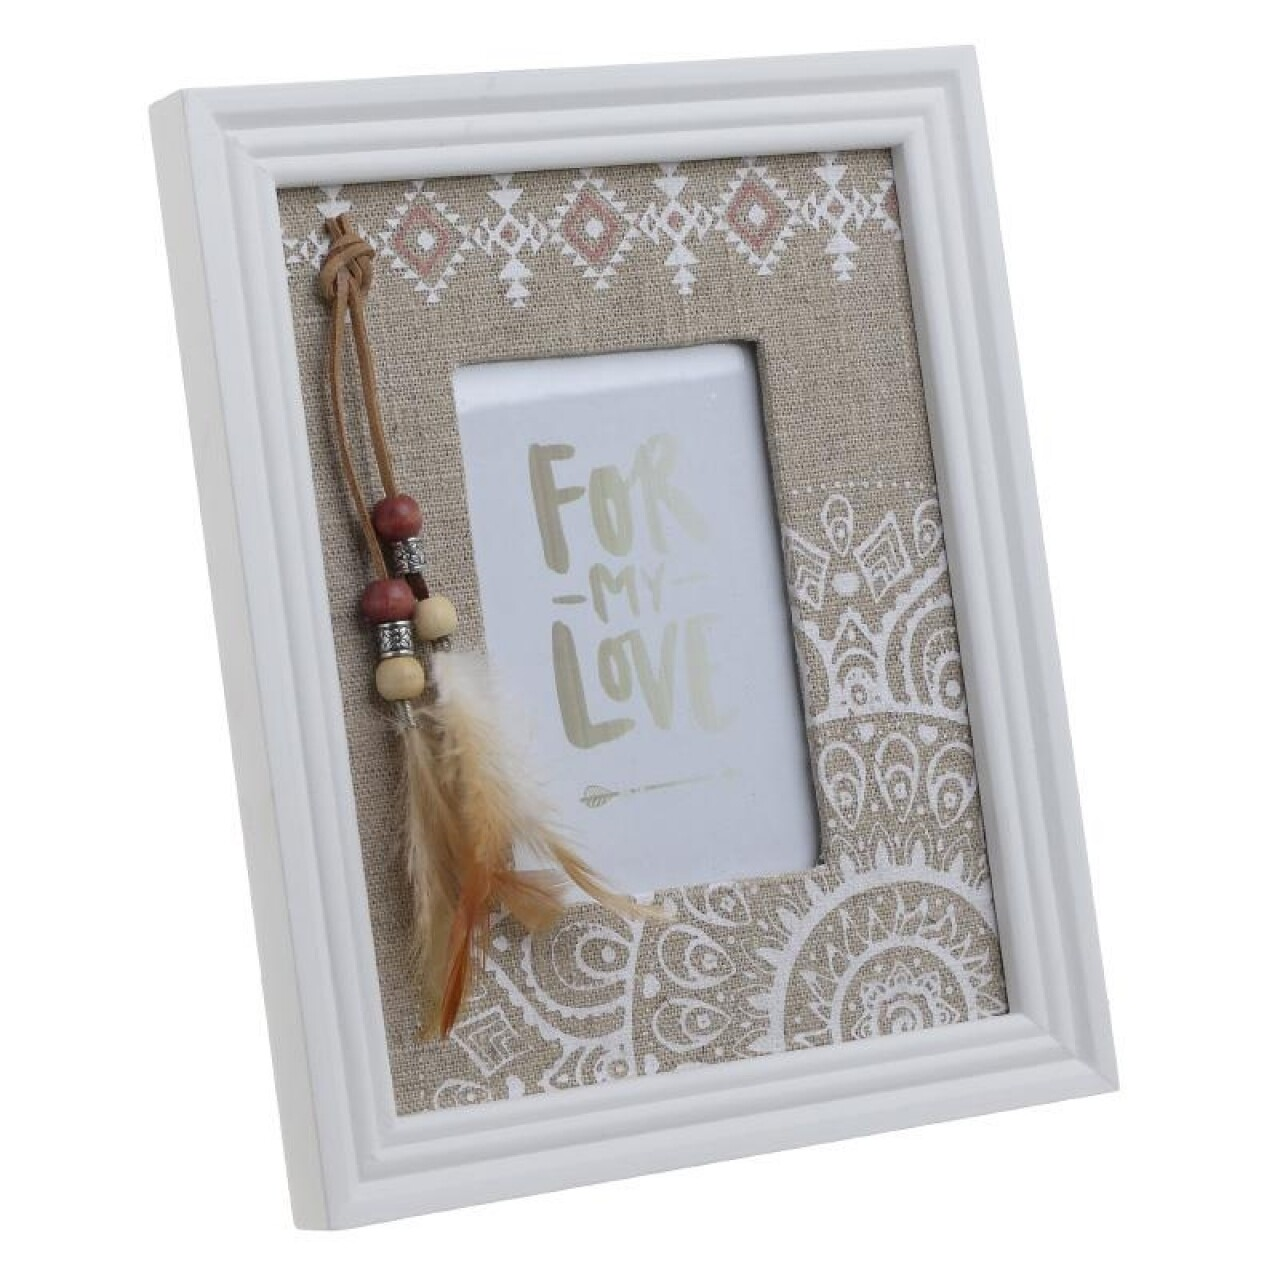 Rama foto For my love, InArt, 20 x 24 cm, lemn, alb/natur